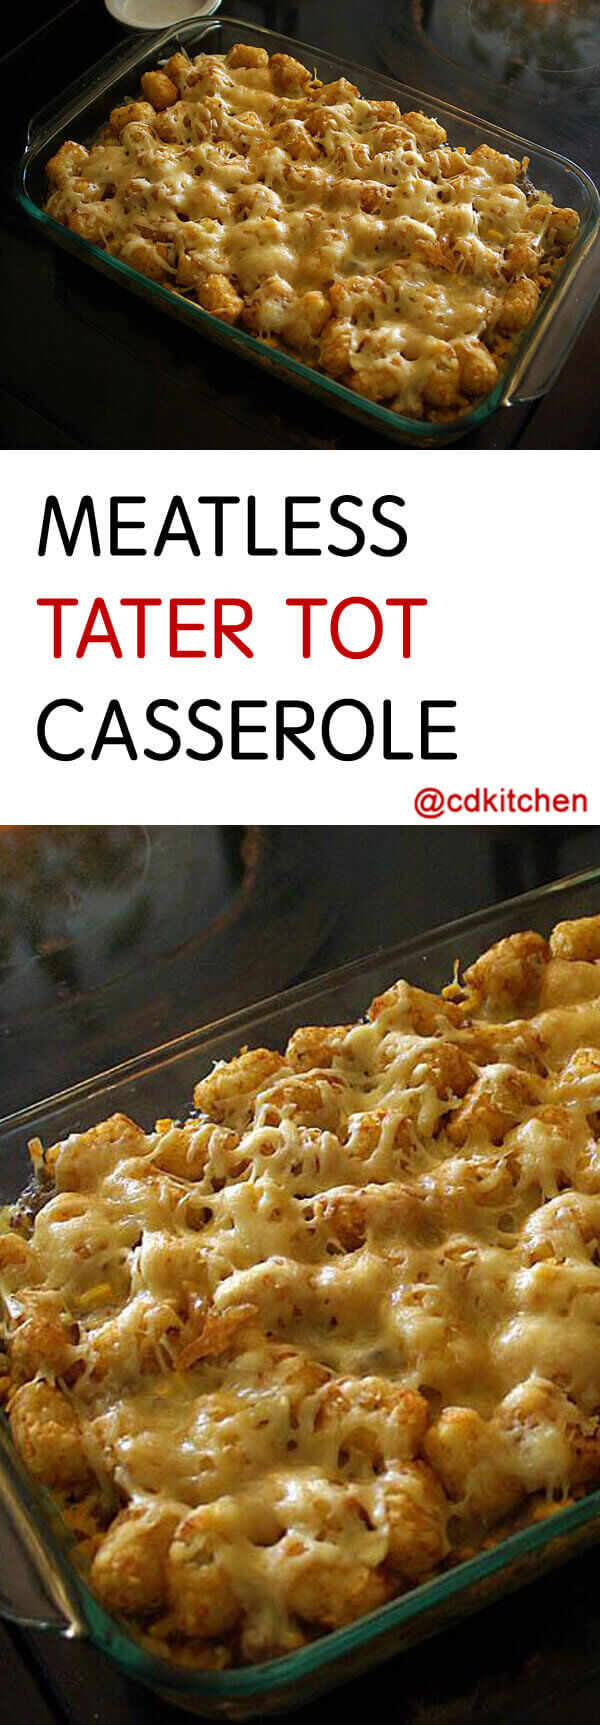 Meatless Tater Tot Casserole Recipe   CDKitchen.com